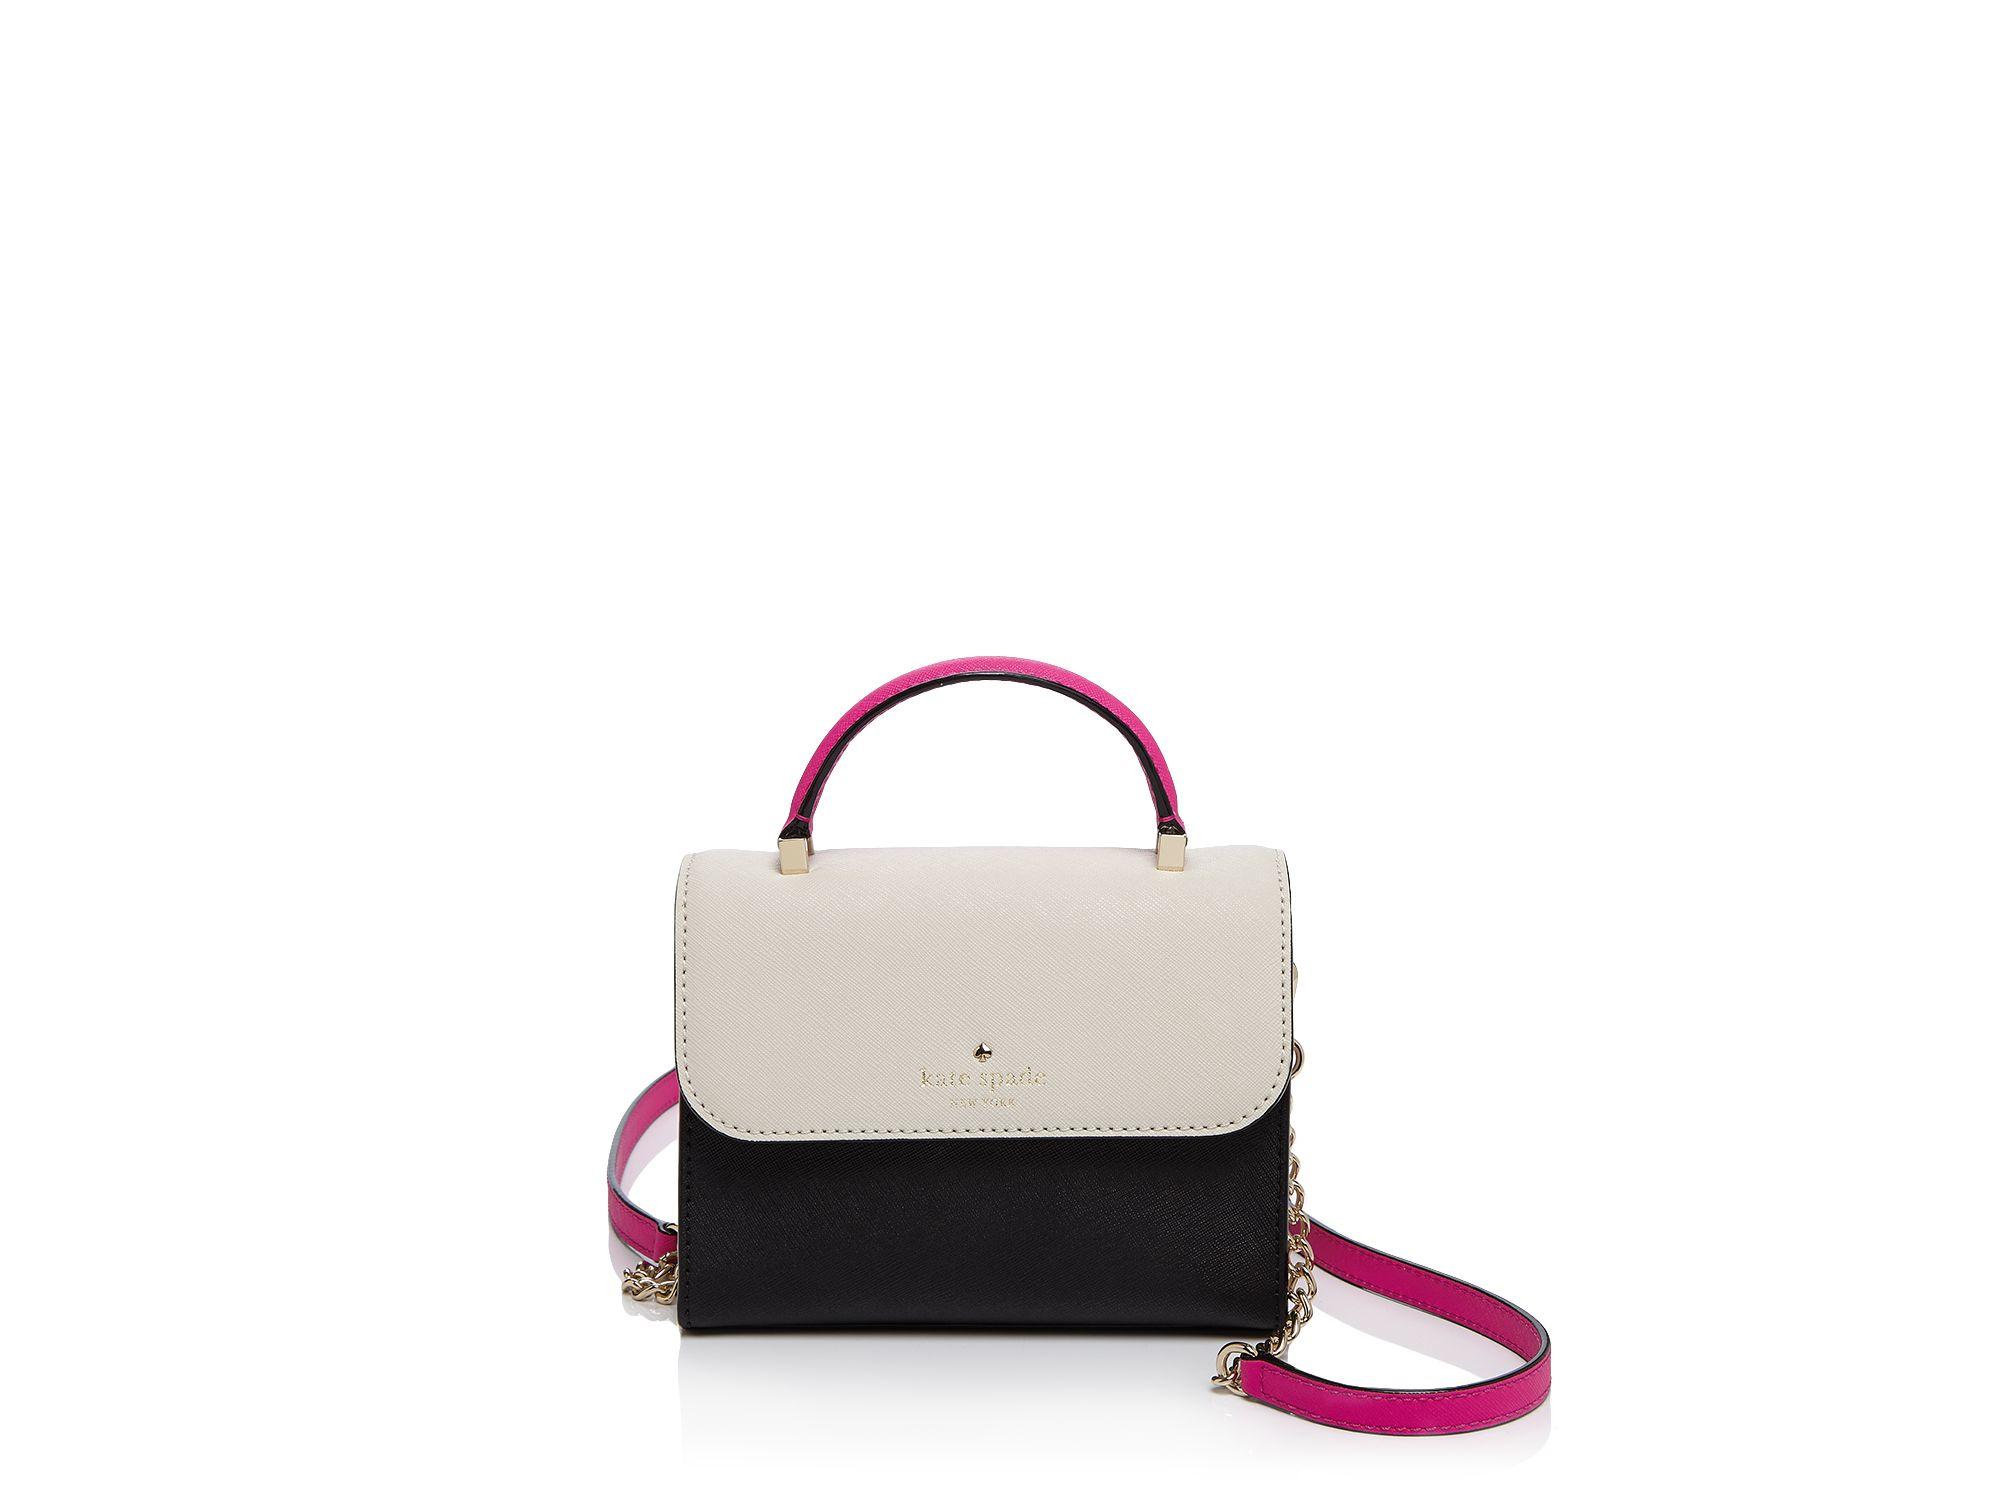 c8179f99fa7c Lyst - Kate Spade Cedar Street Color Block Mini Nora Crossbody in Black